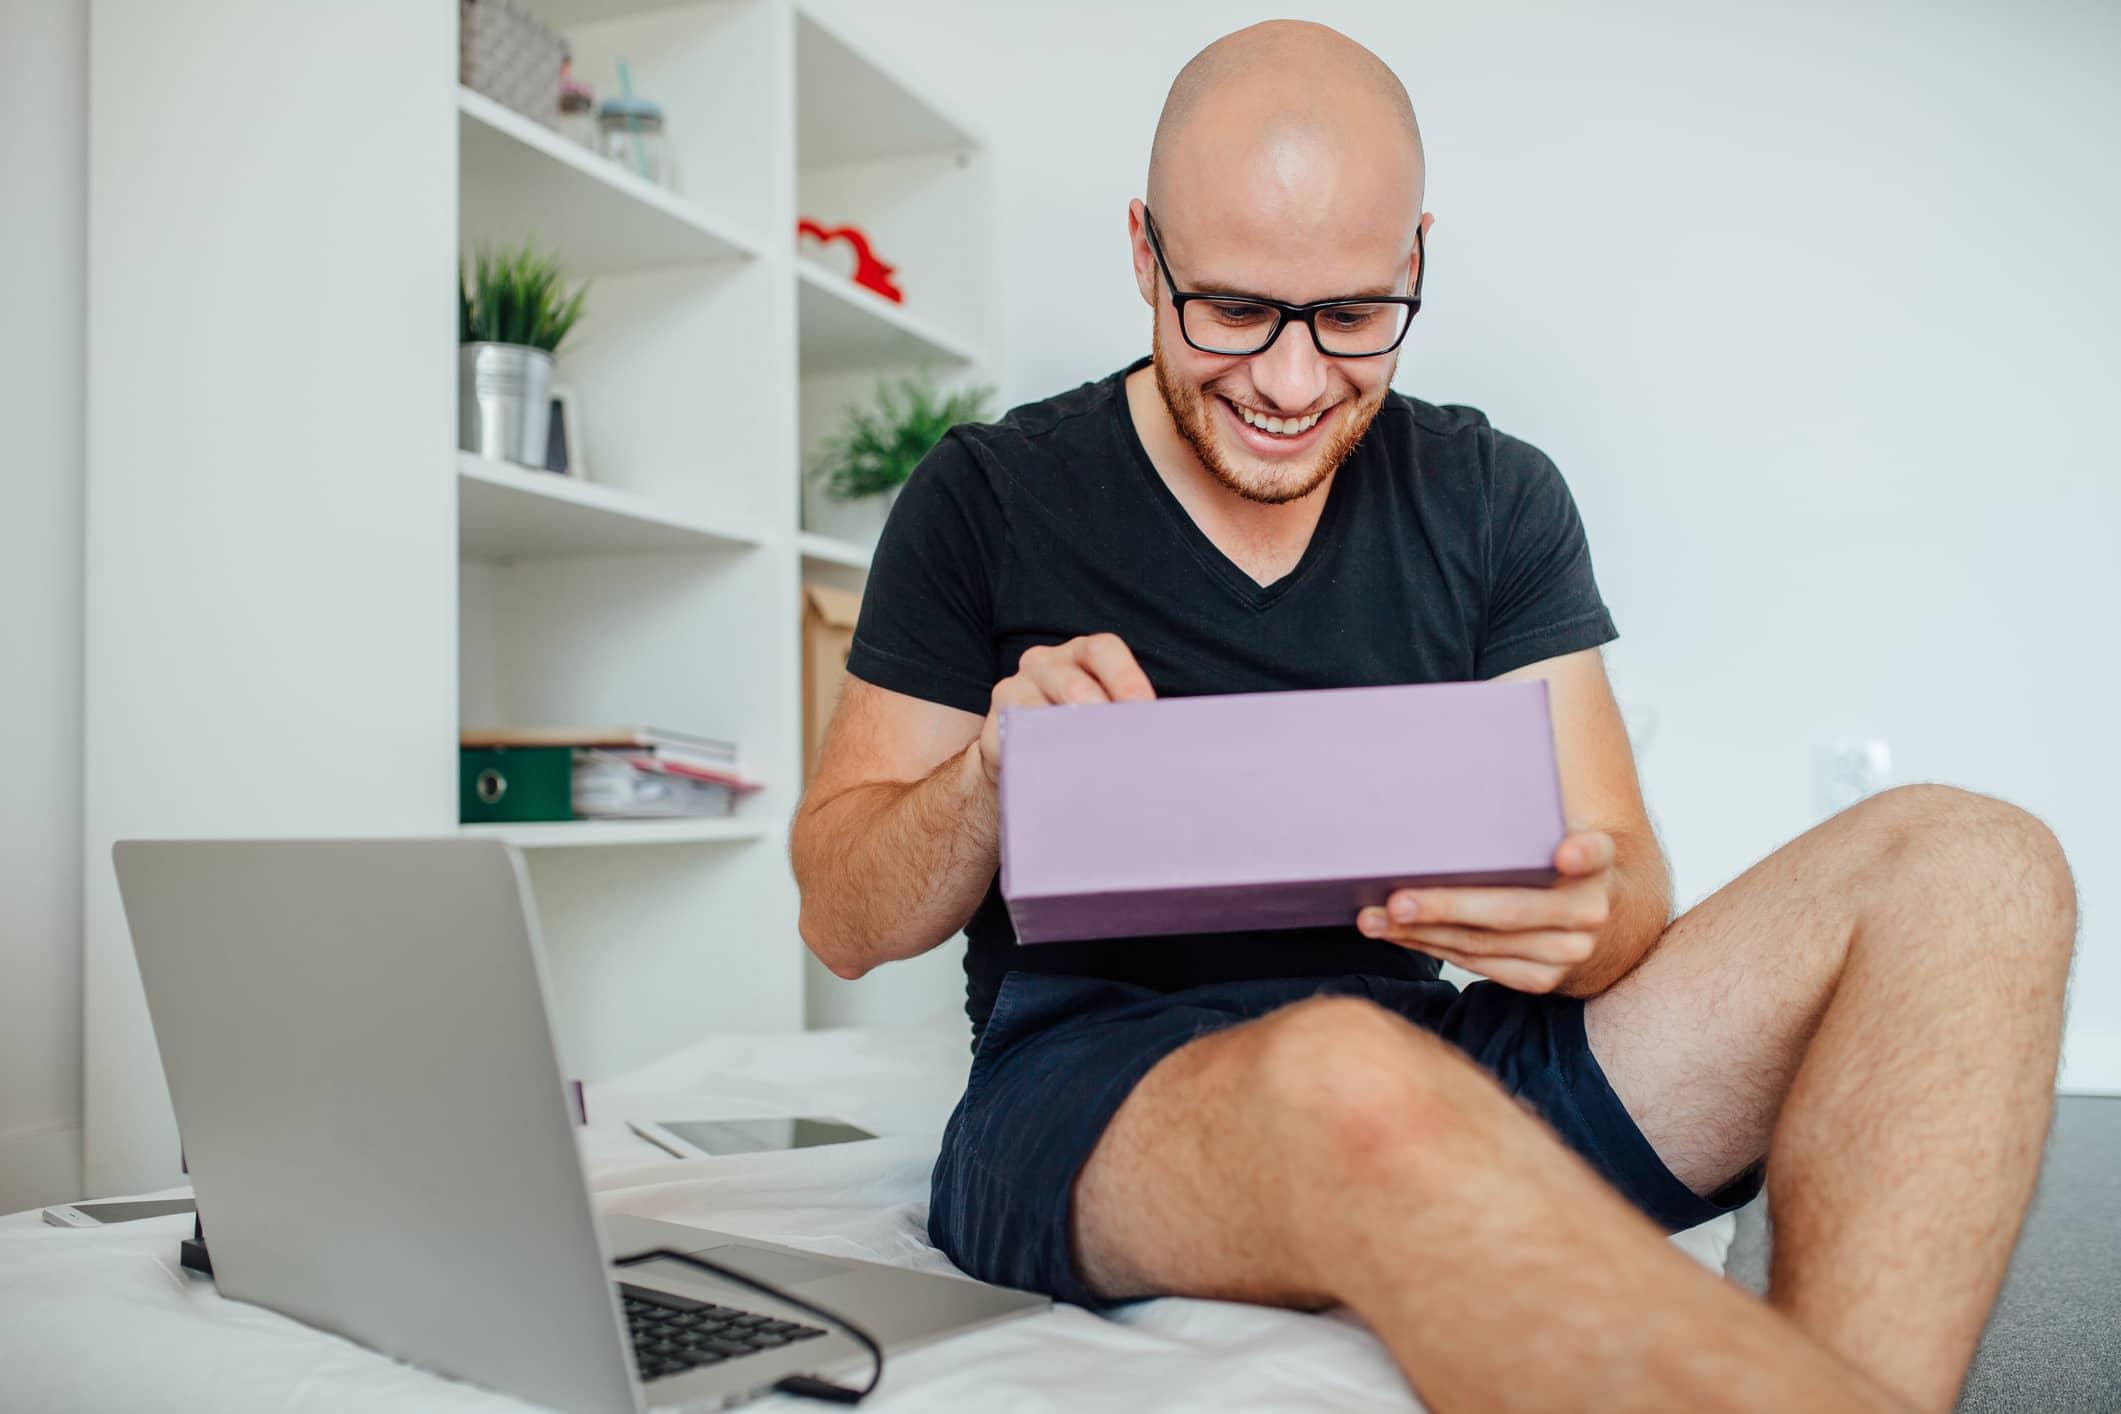 man opening box in bedroom